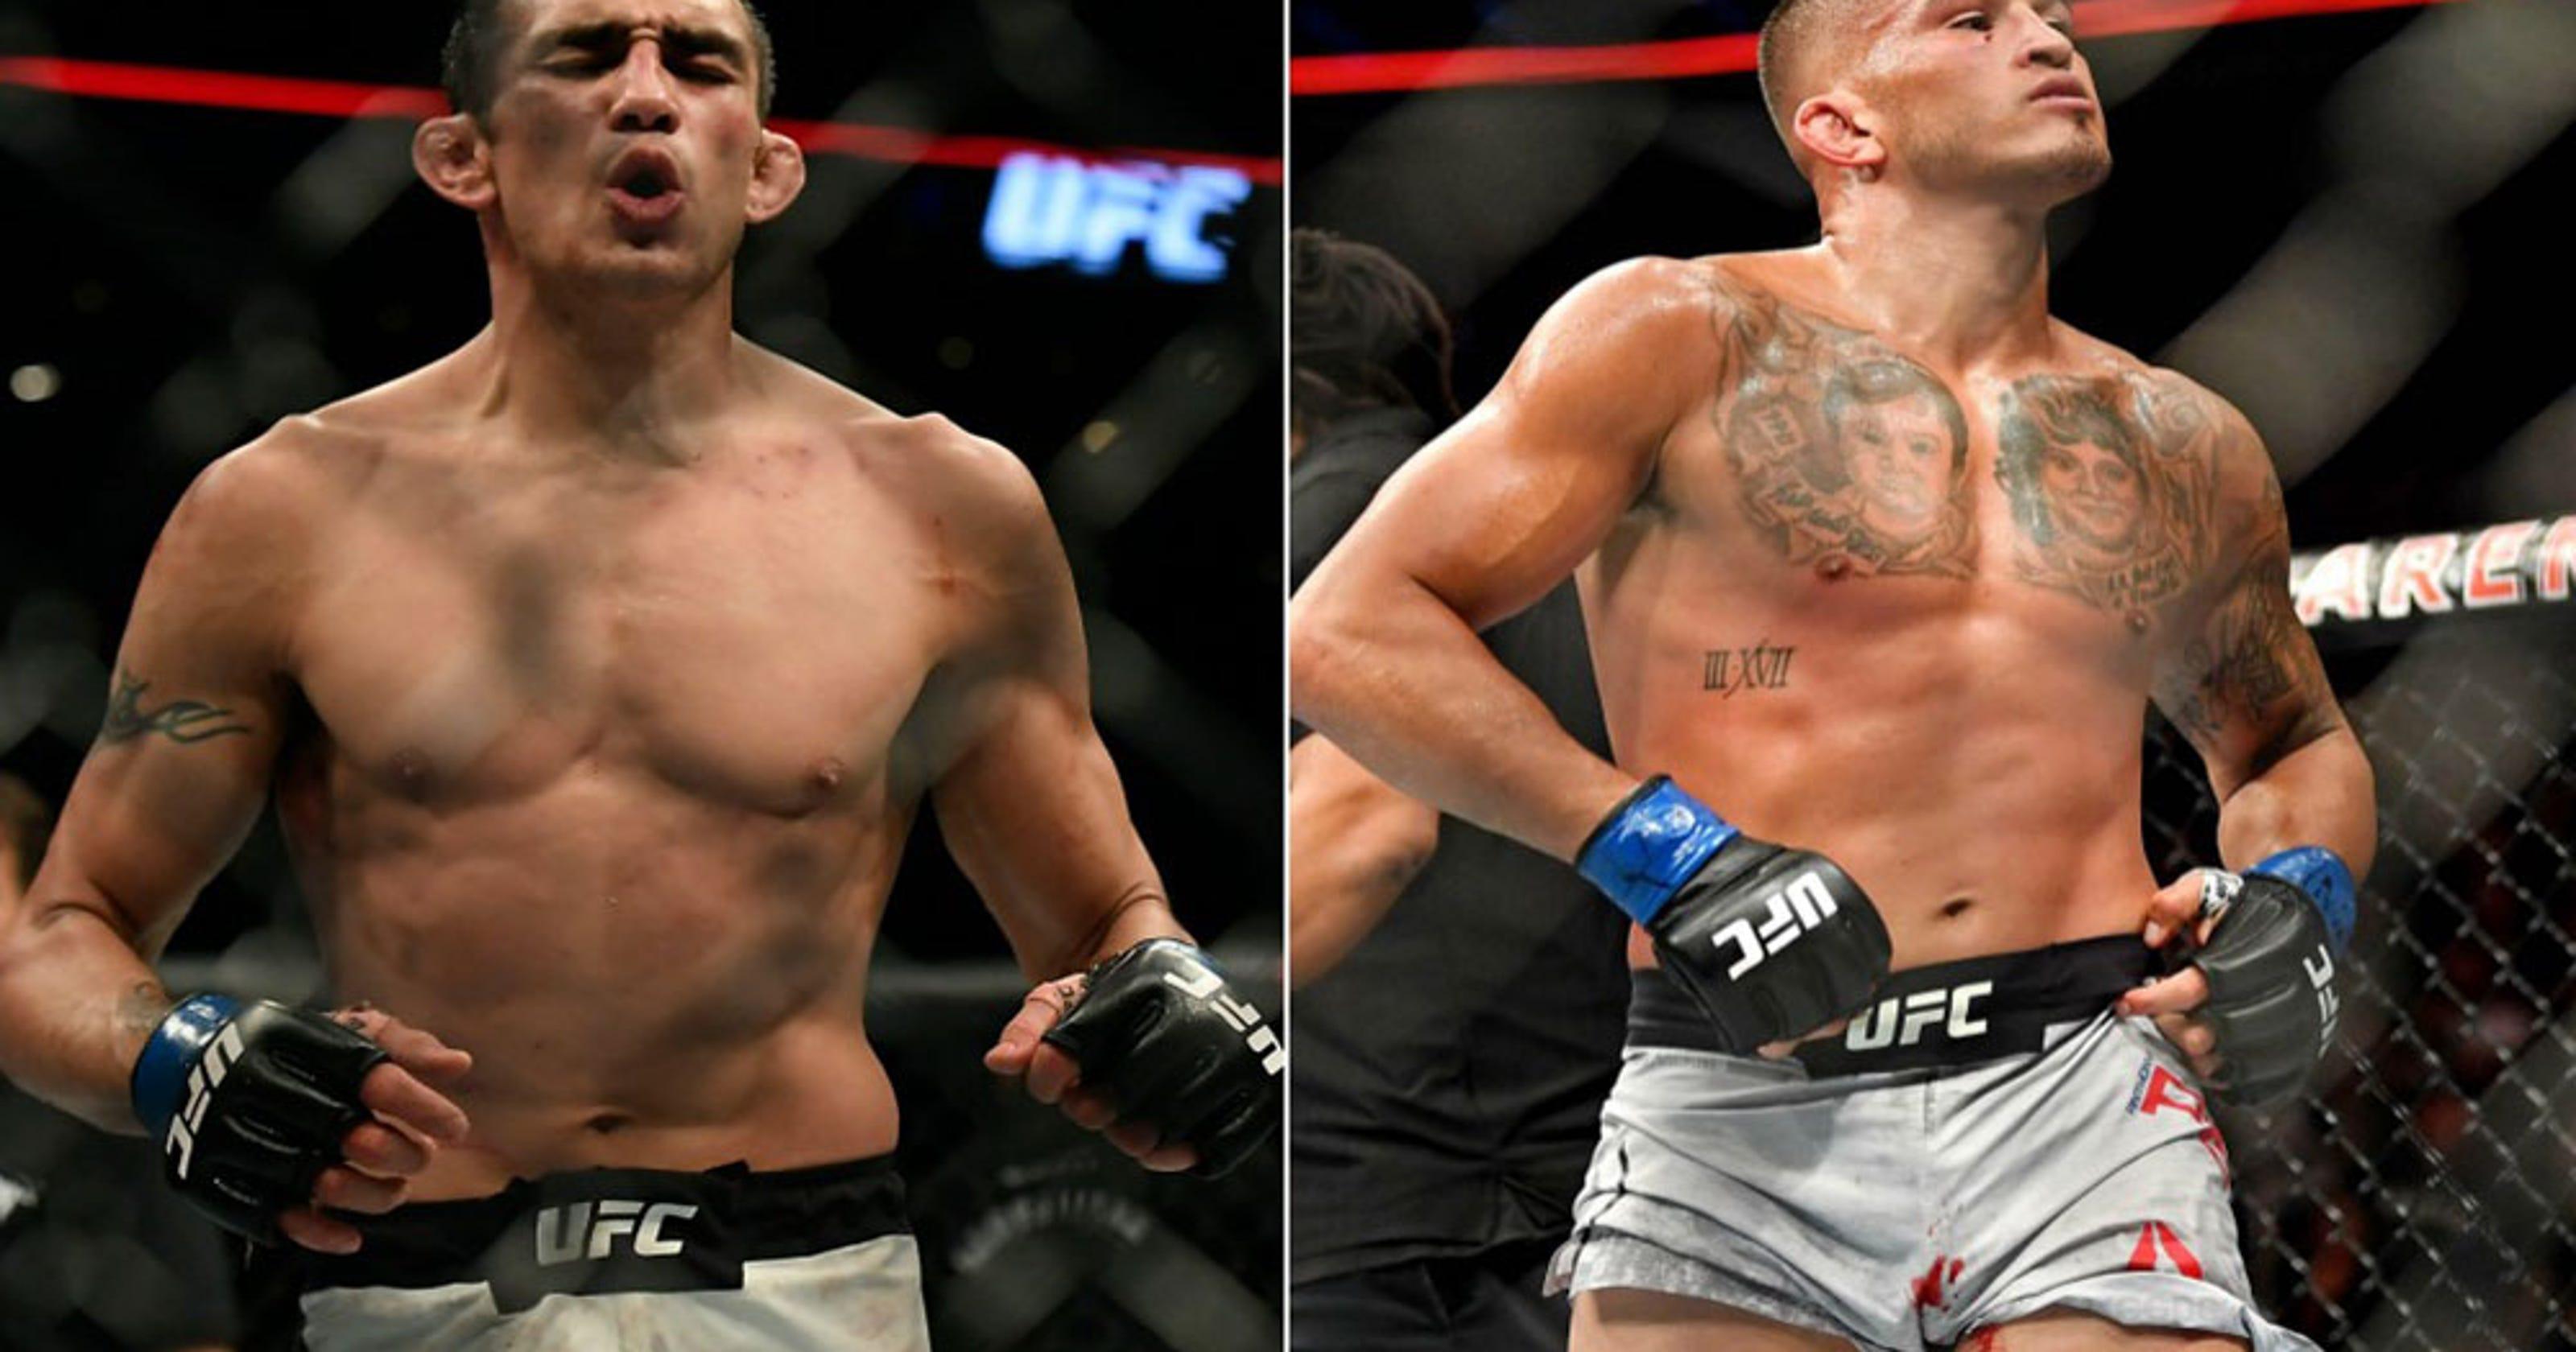 Tony Ferguson to make UFC comeback vs. Anthony Pettis